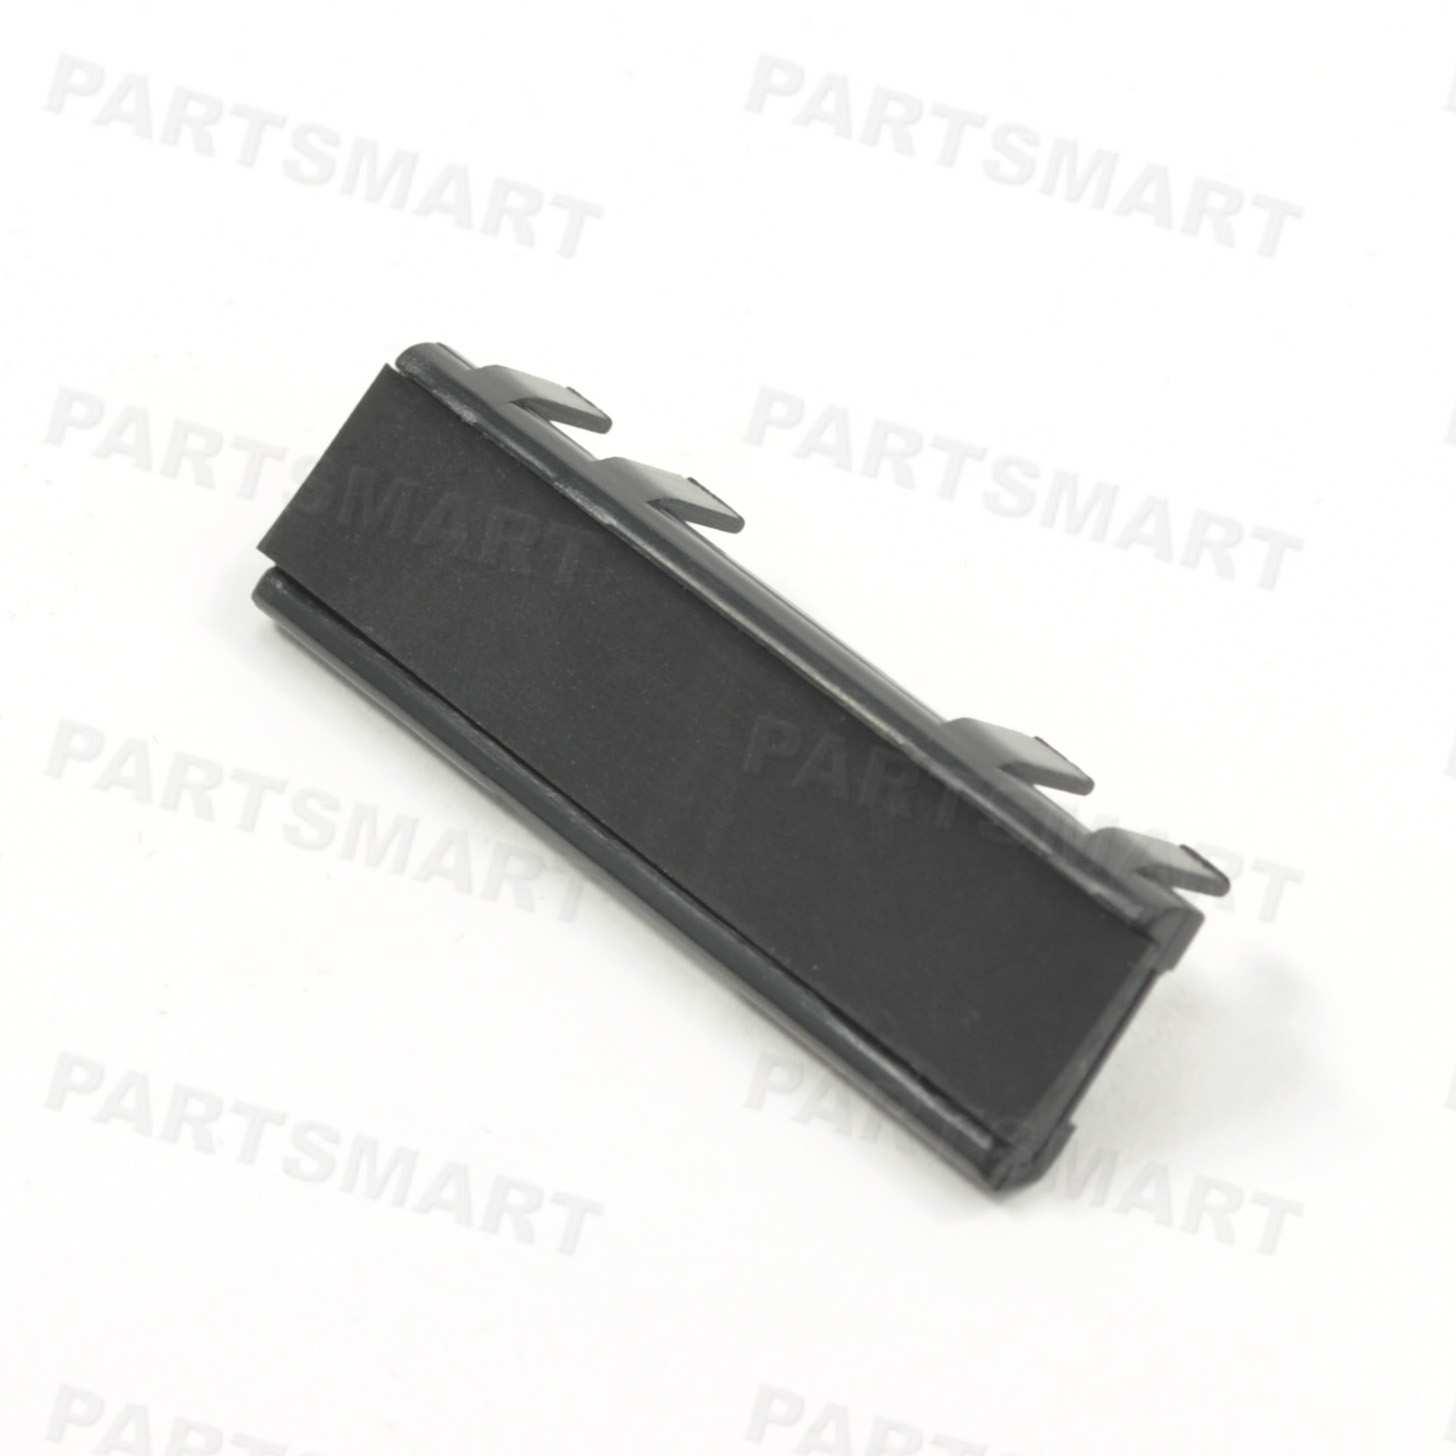 RL1-2115-000 Separation Pad, Tray 1 for HP LaserJet Pro 400 M401, LaserJet P2035